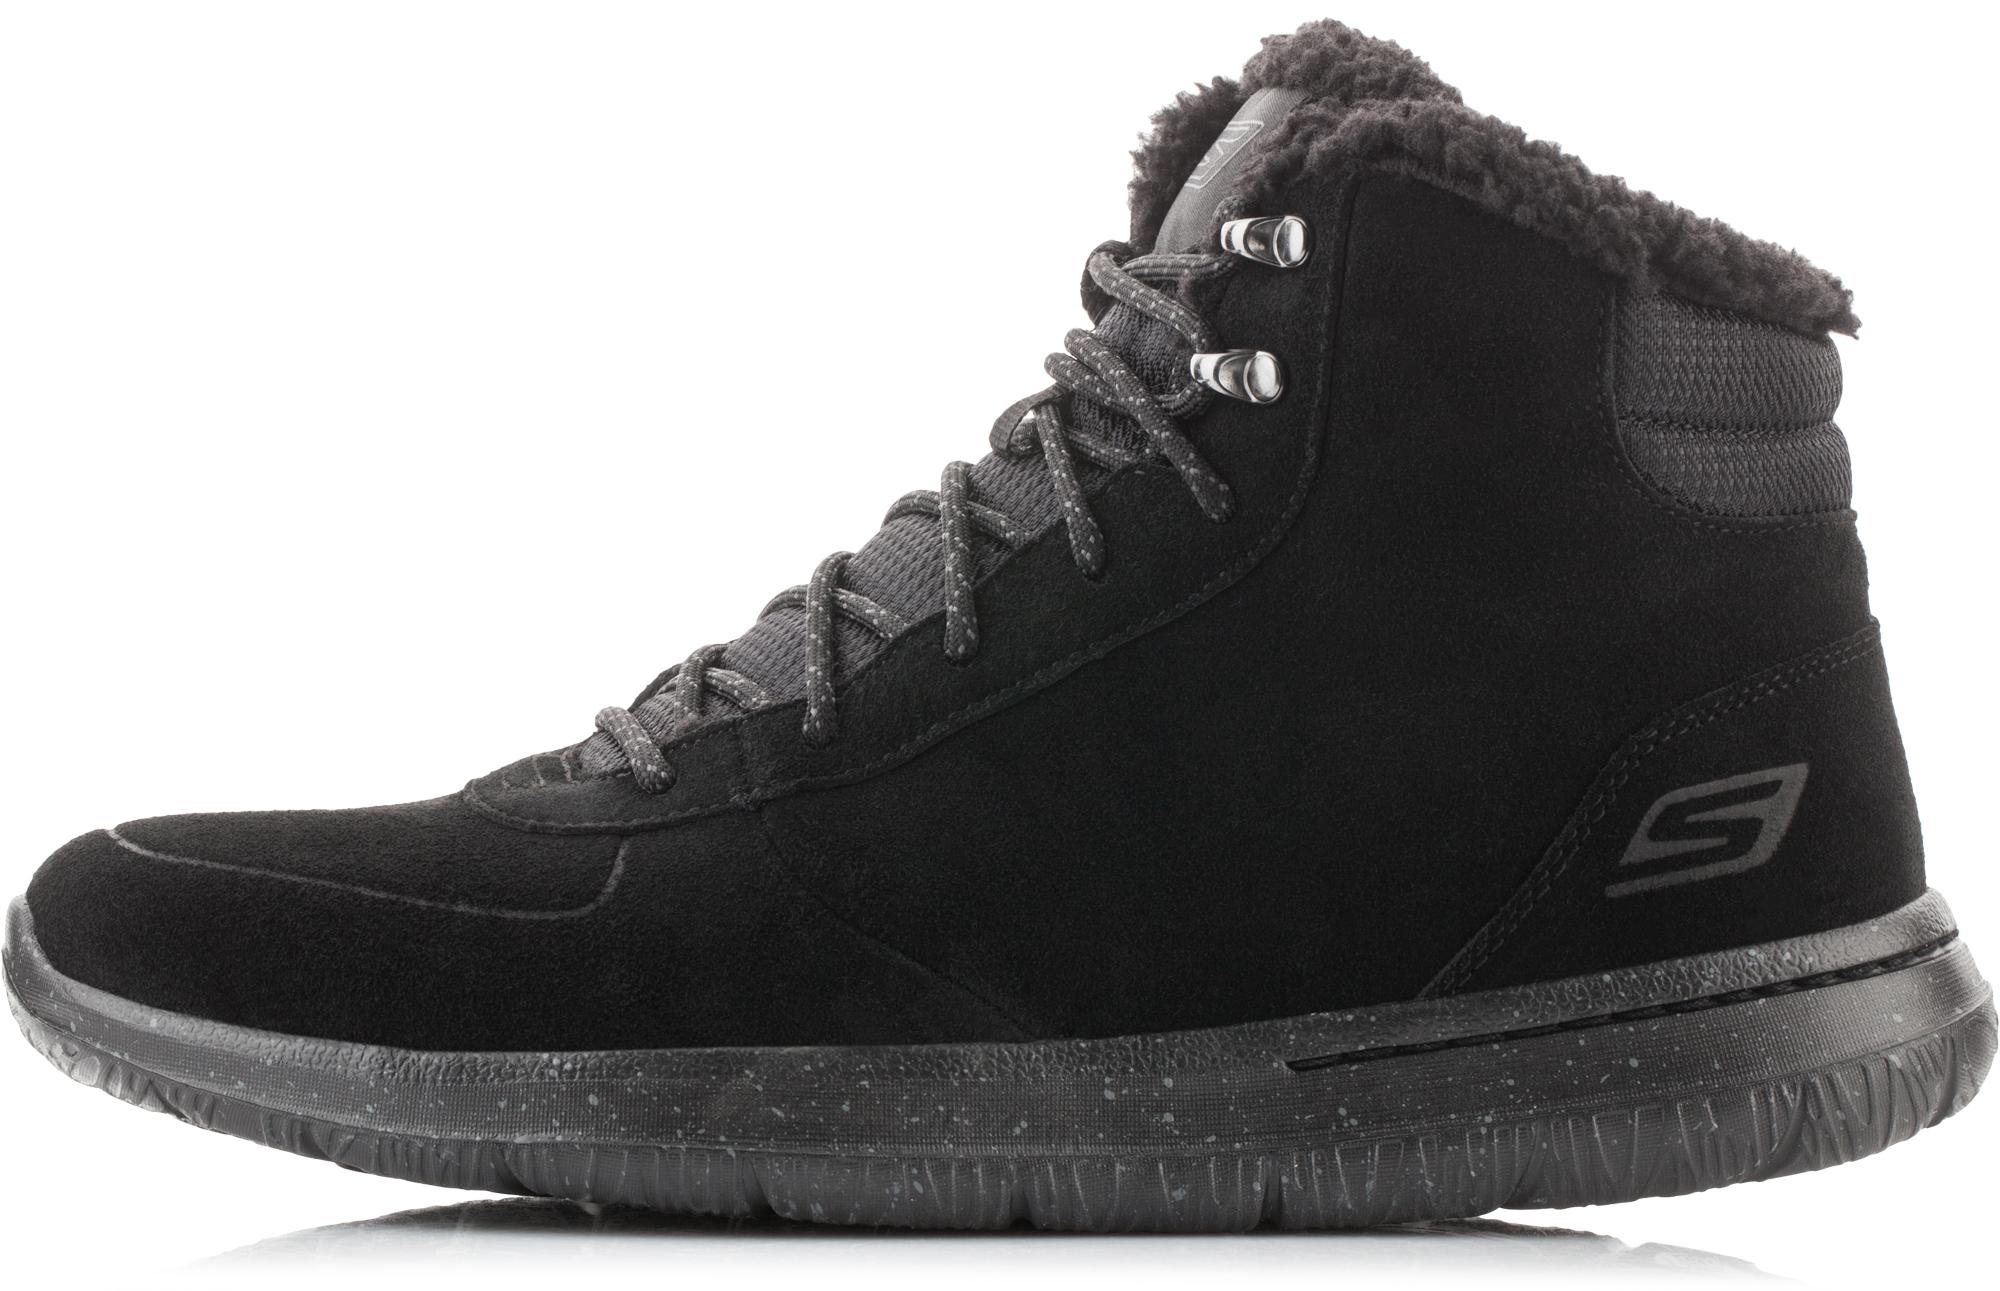 Skechers Ботинки утепленные мужские Skechers Go Walk City-Sierra, размер 44